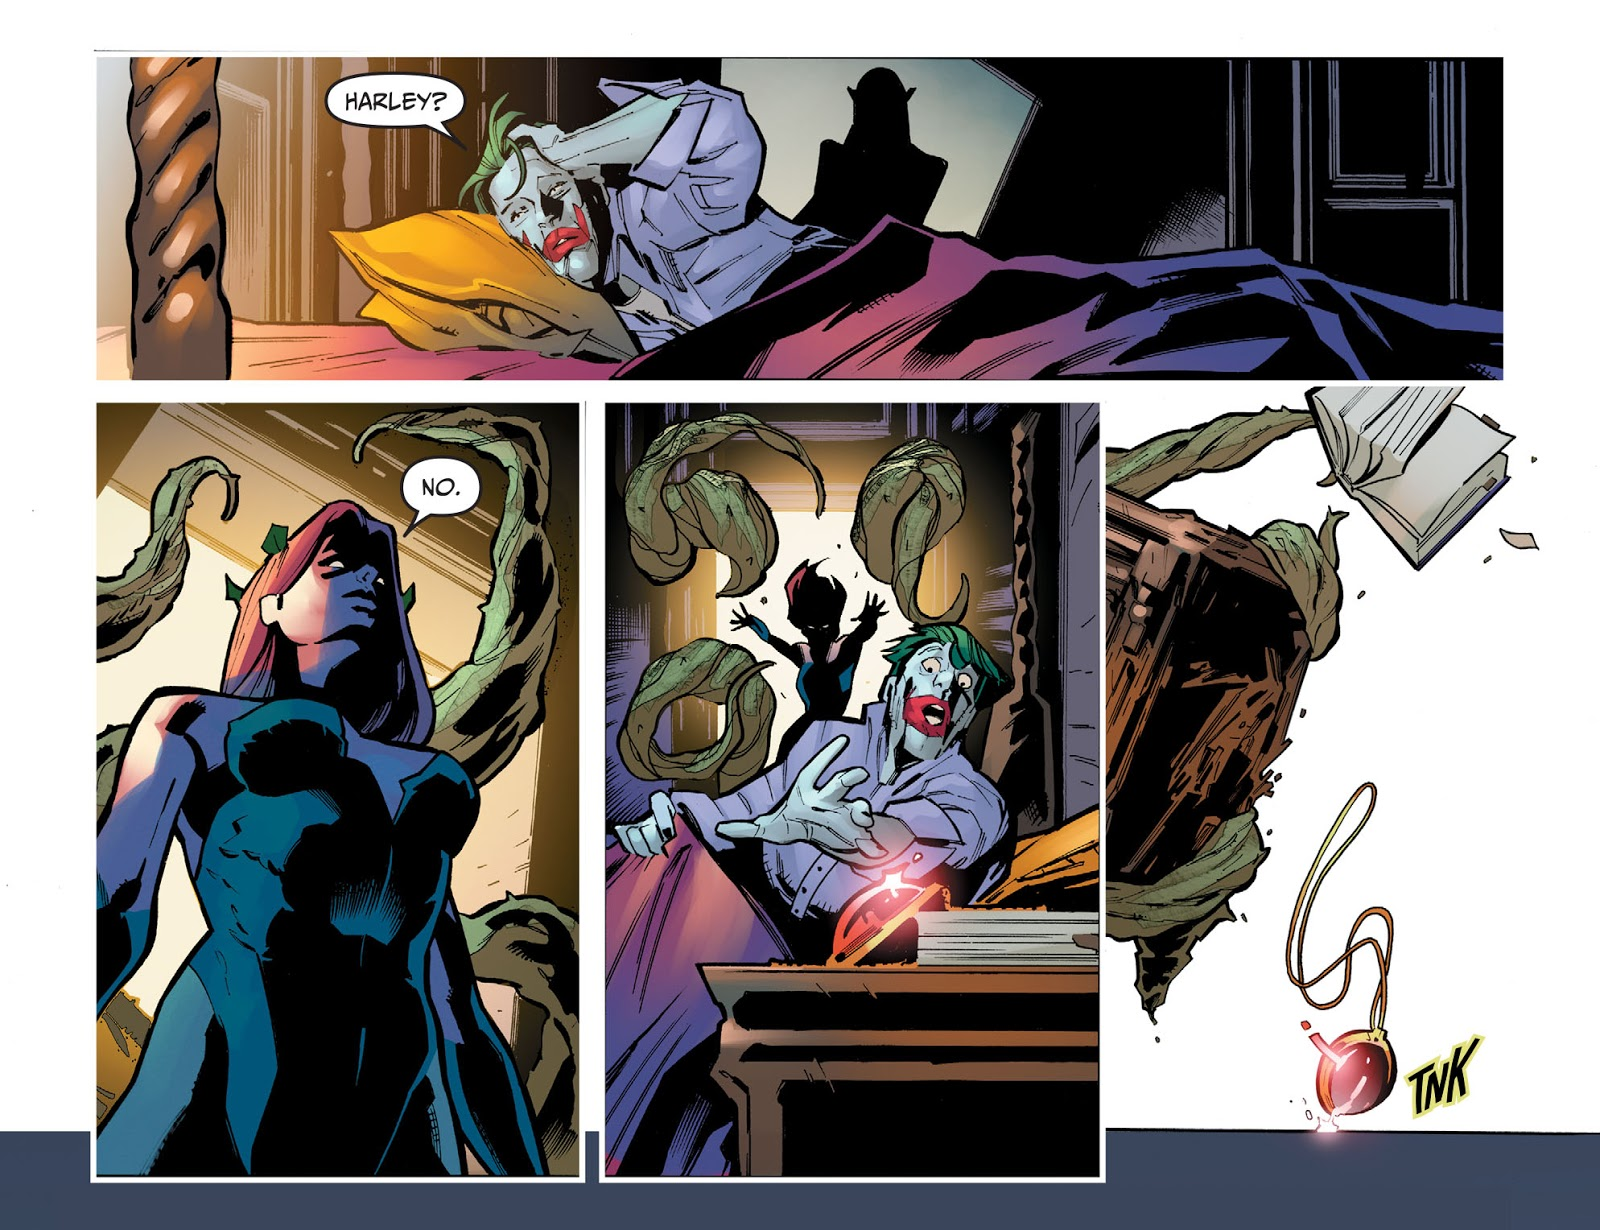 Poison Ivy Threatens The Joker (Injustice Gods Among Us) Poison Ivy Threatens The Joker (Injustice Gods Among Us)